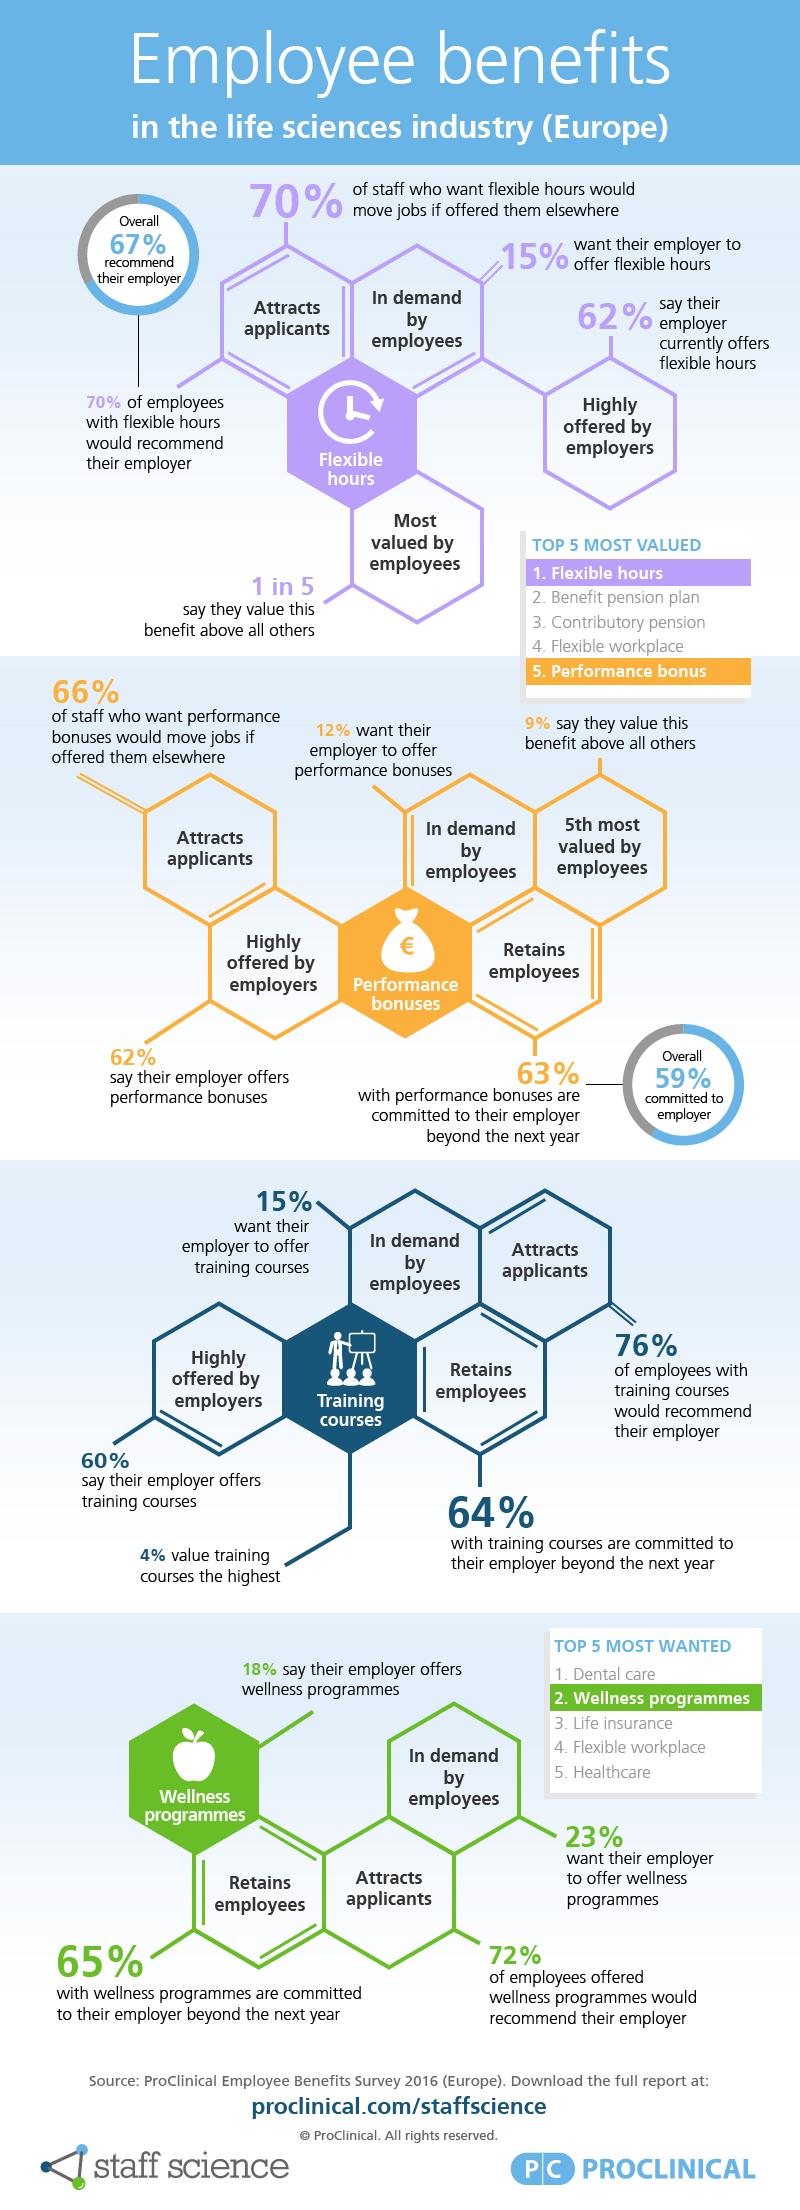 employee-benefits-infographic-europe-lifesciences.png